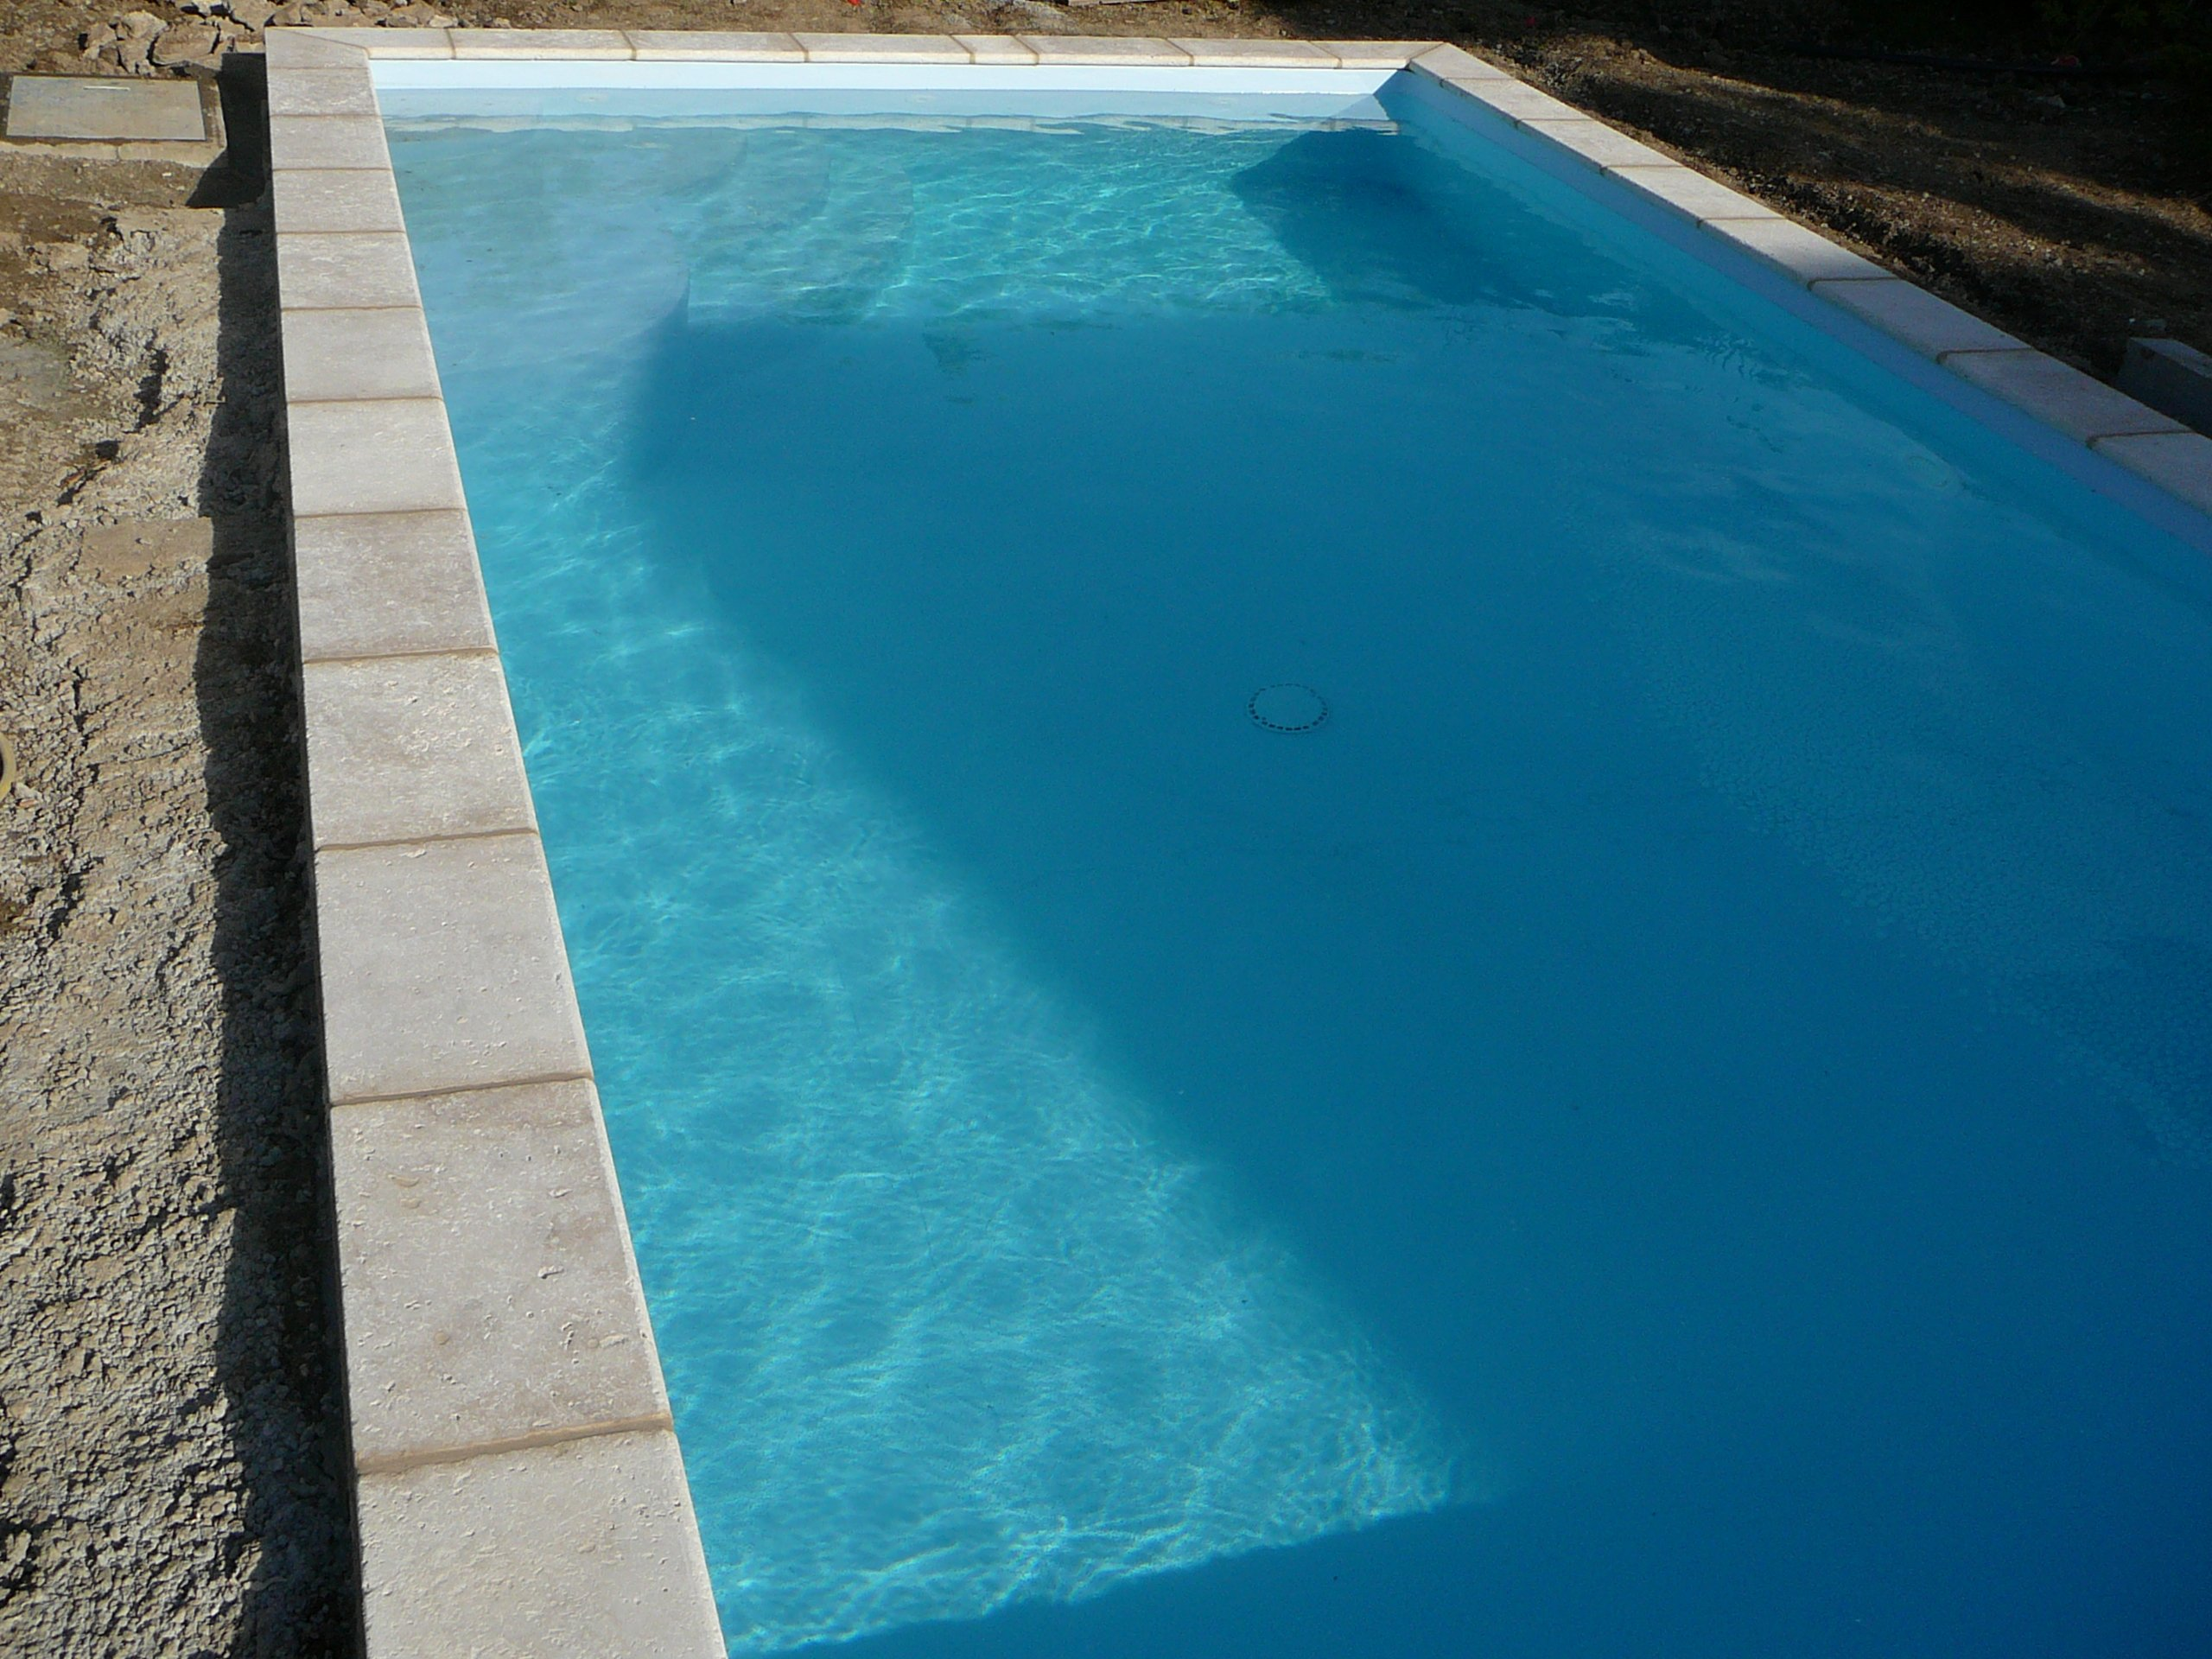 Piscine carr bleu for Carre bleu piscine